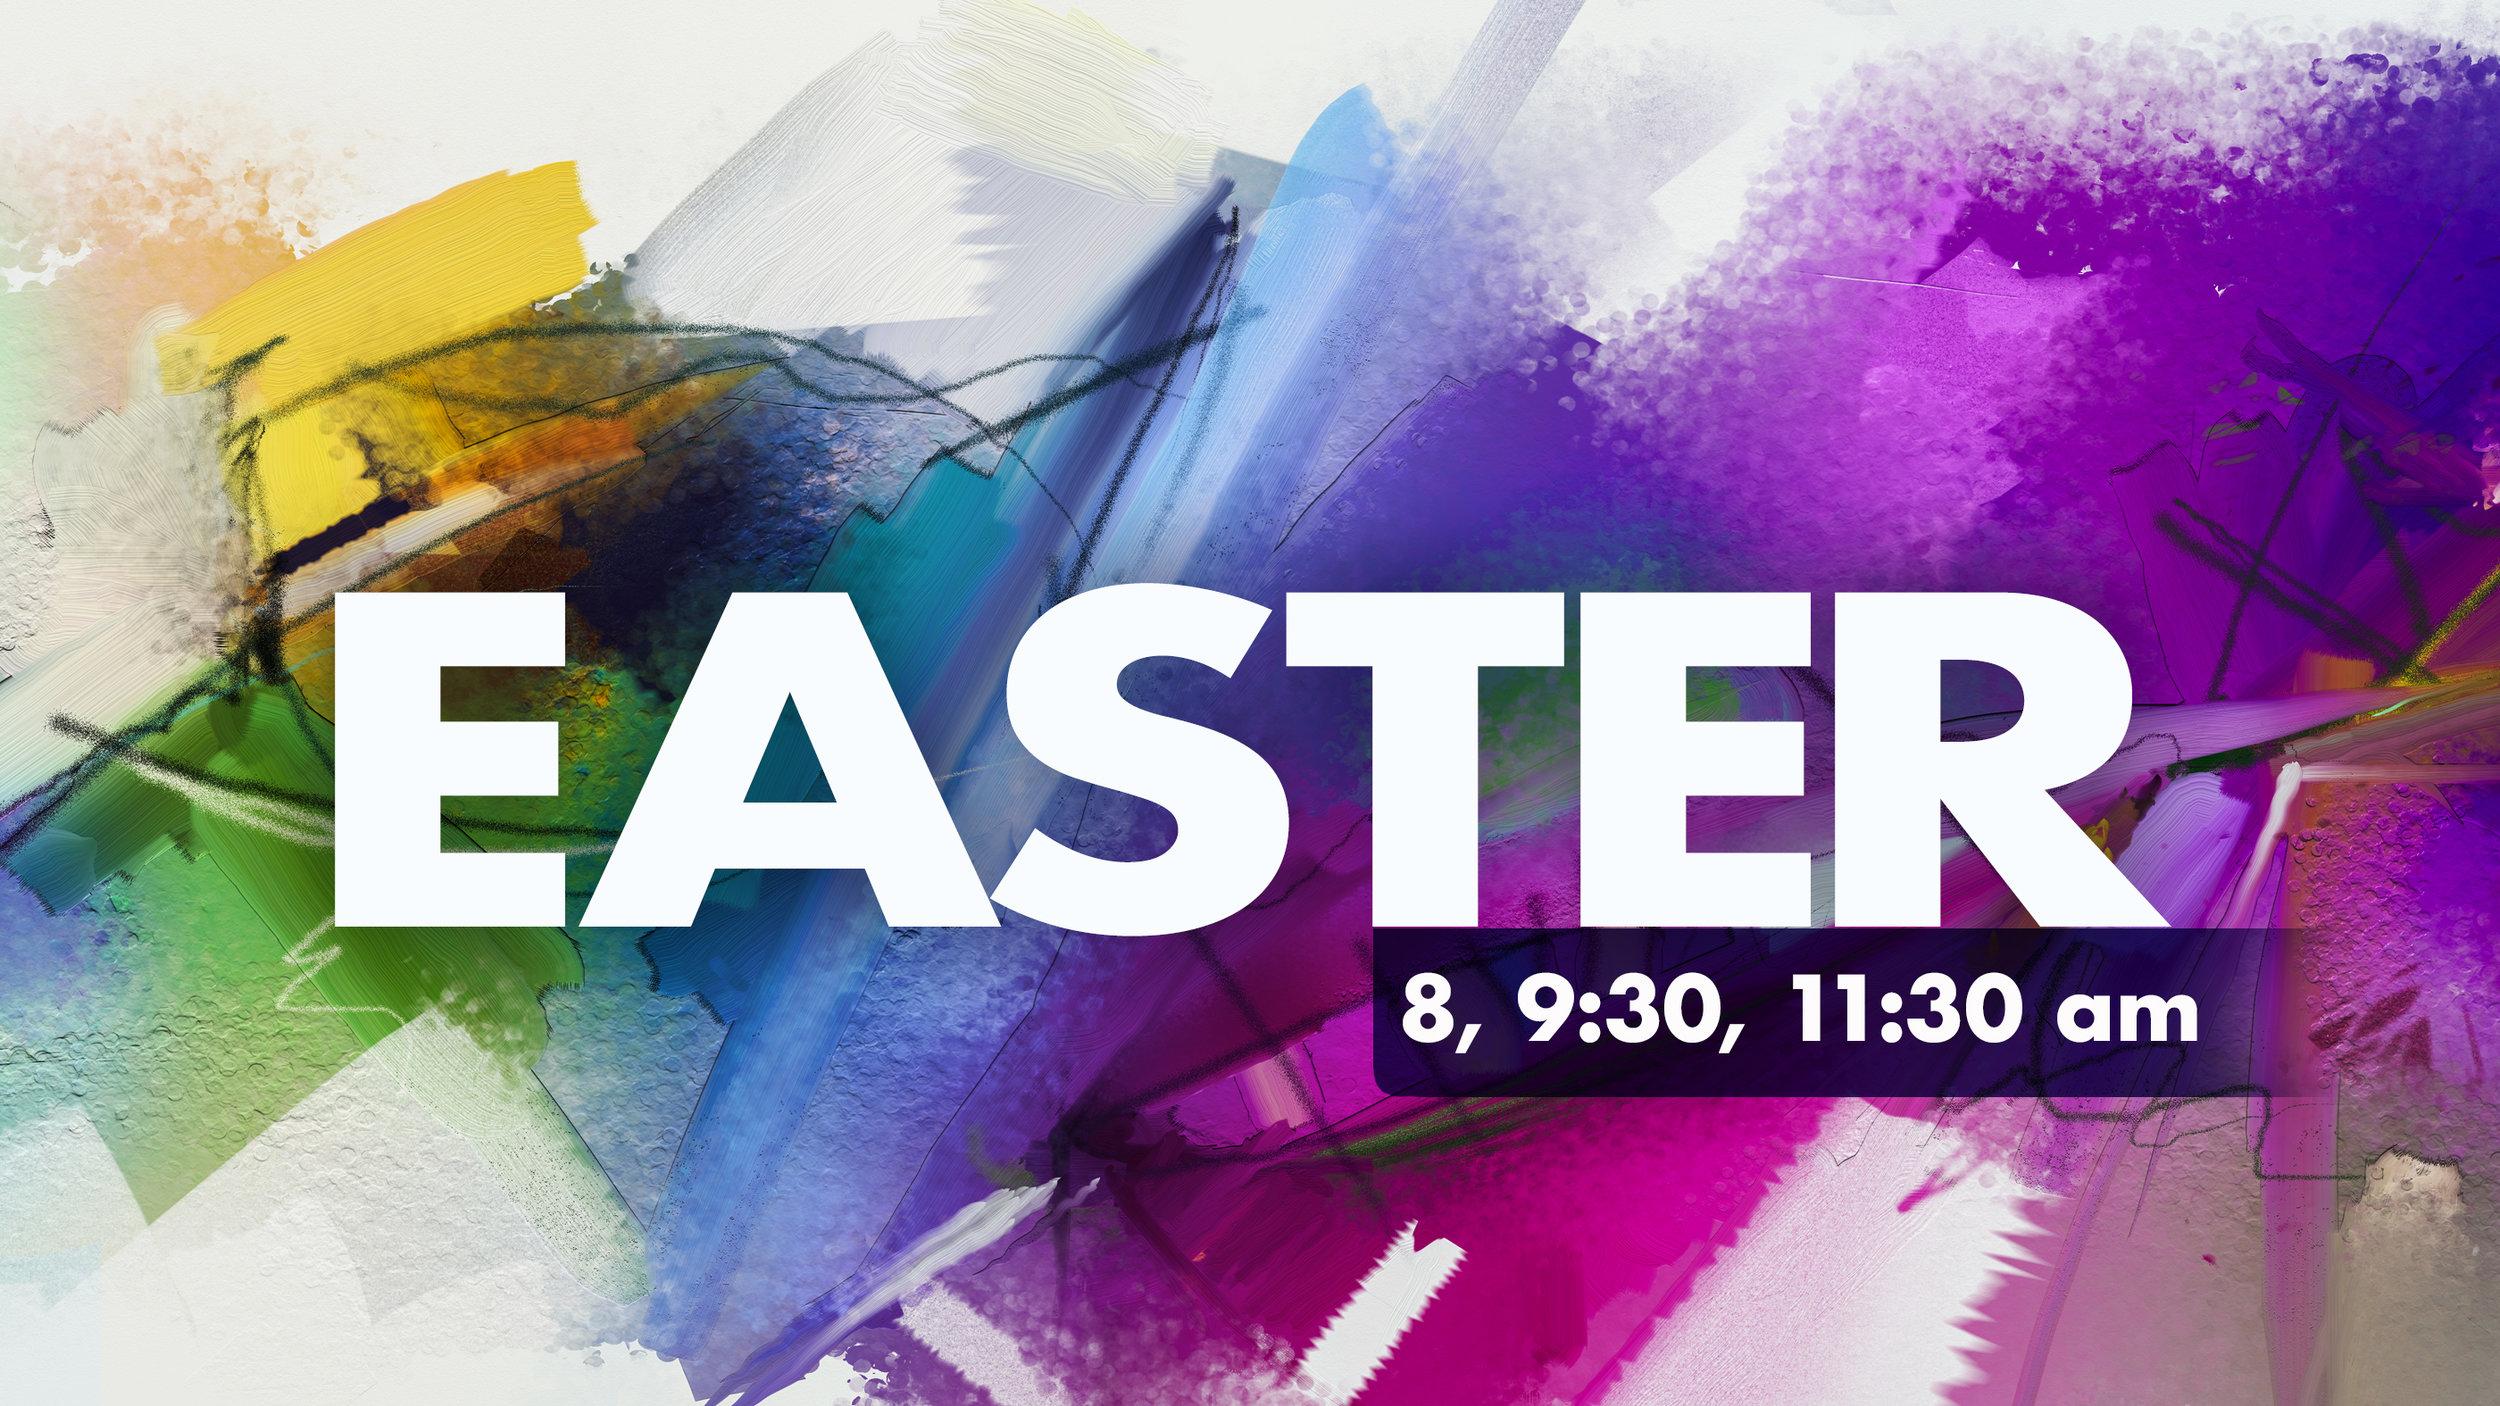 Easter 2019_w times auditorium.jpg